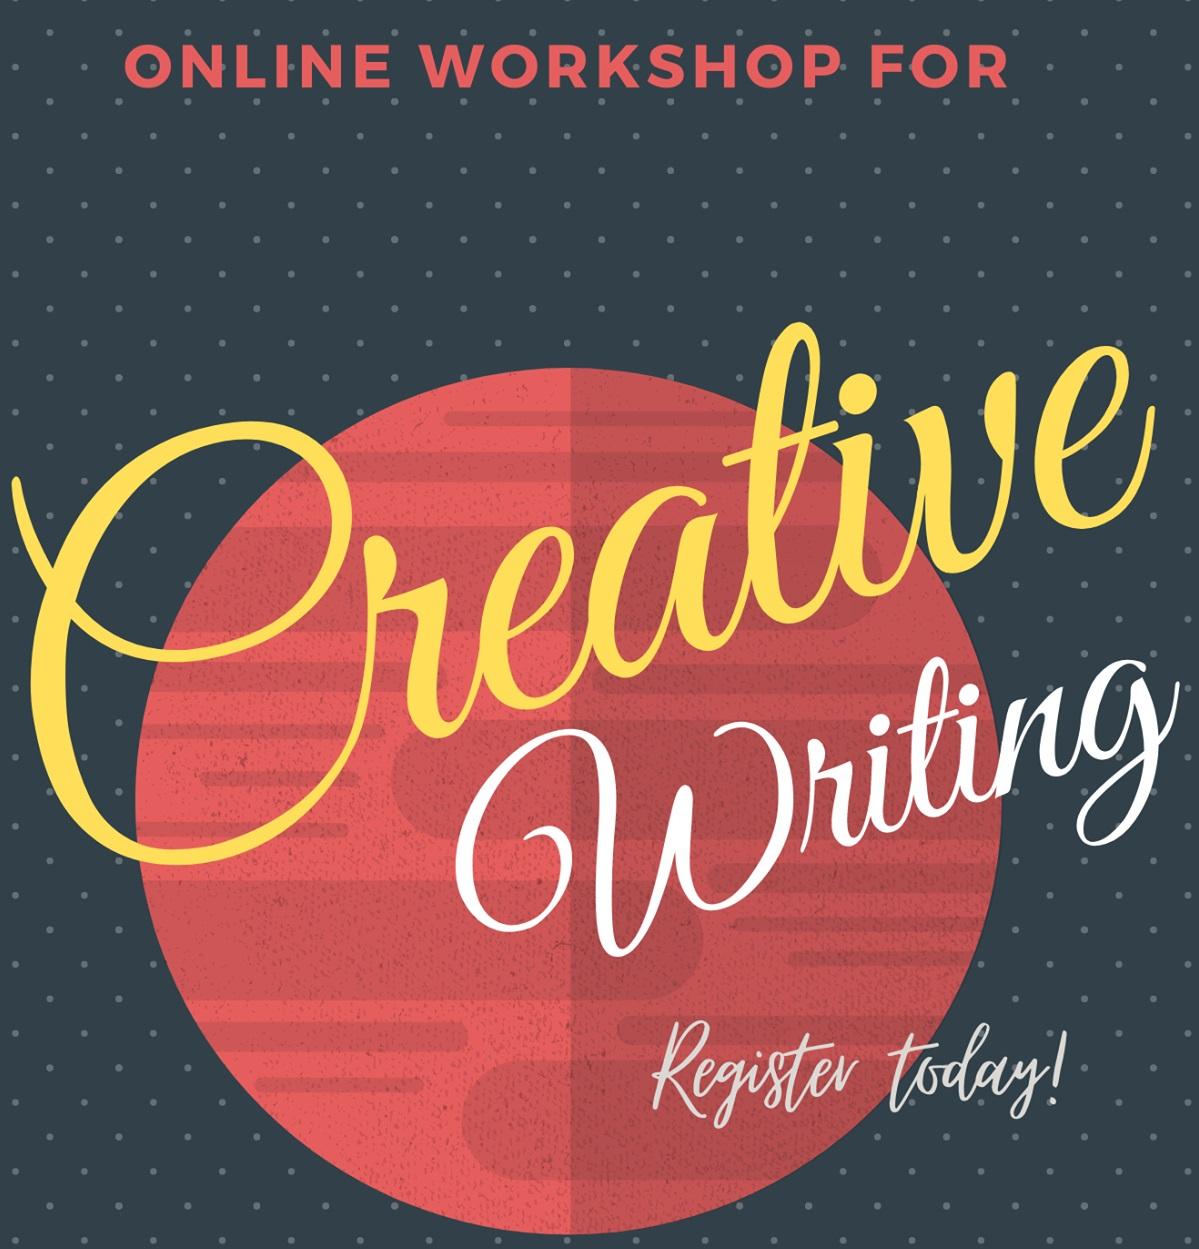 Day 3: Creative Writing Workshop